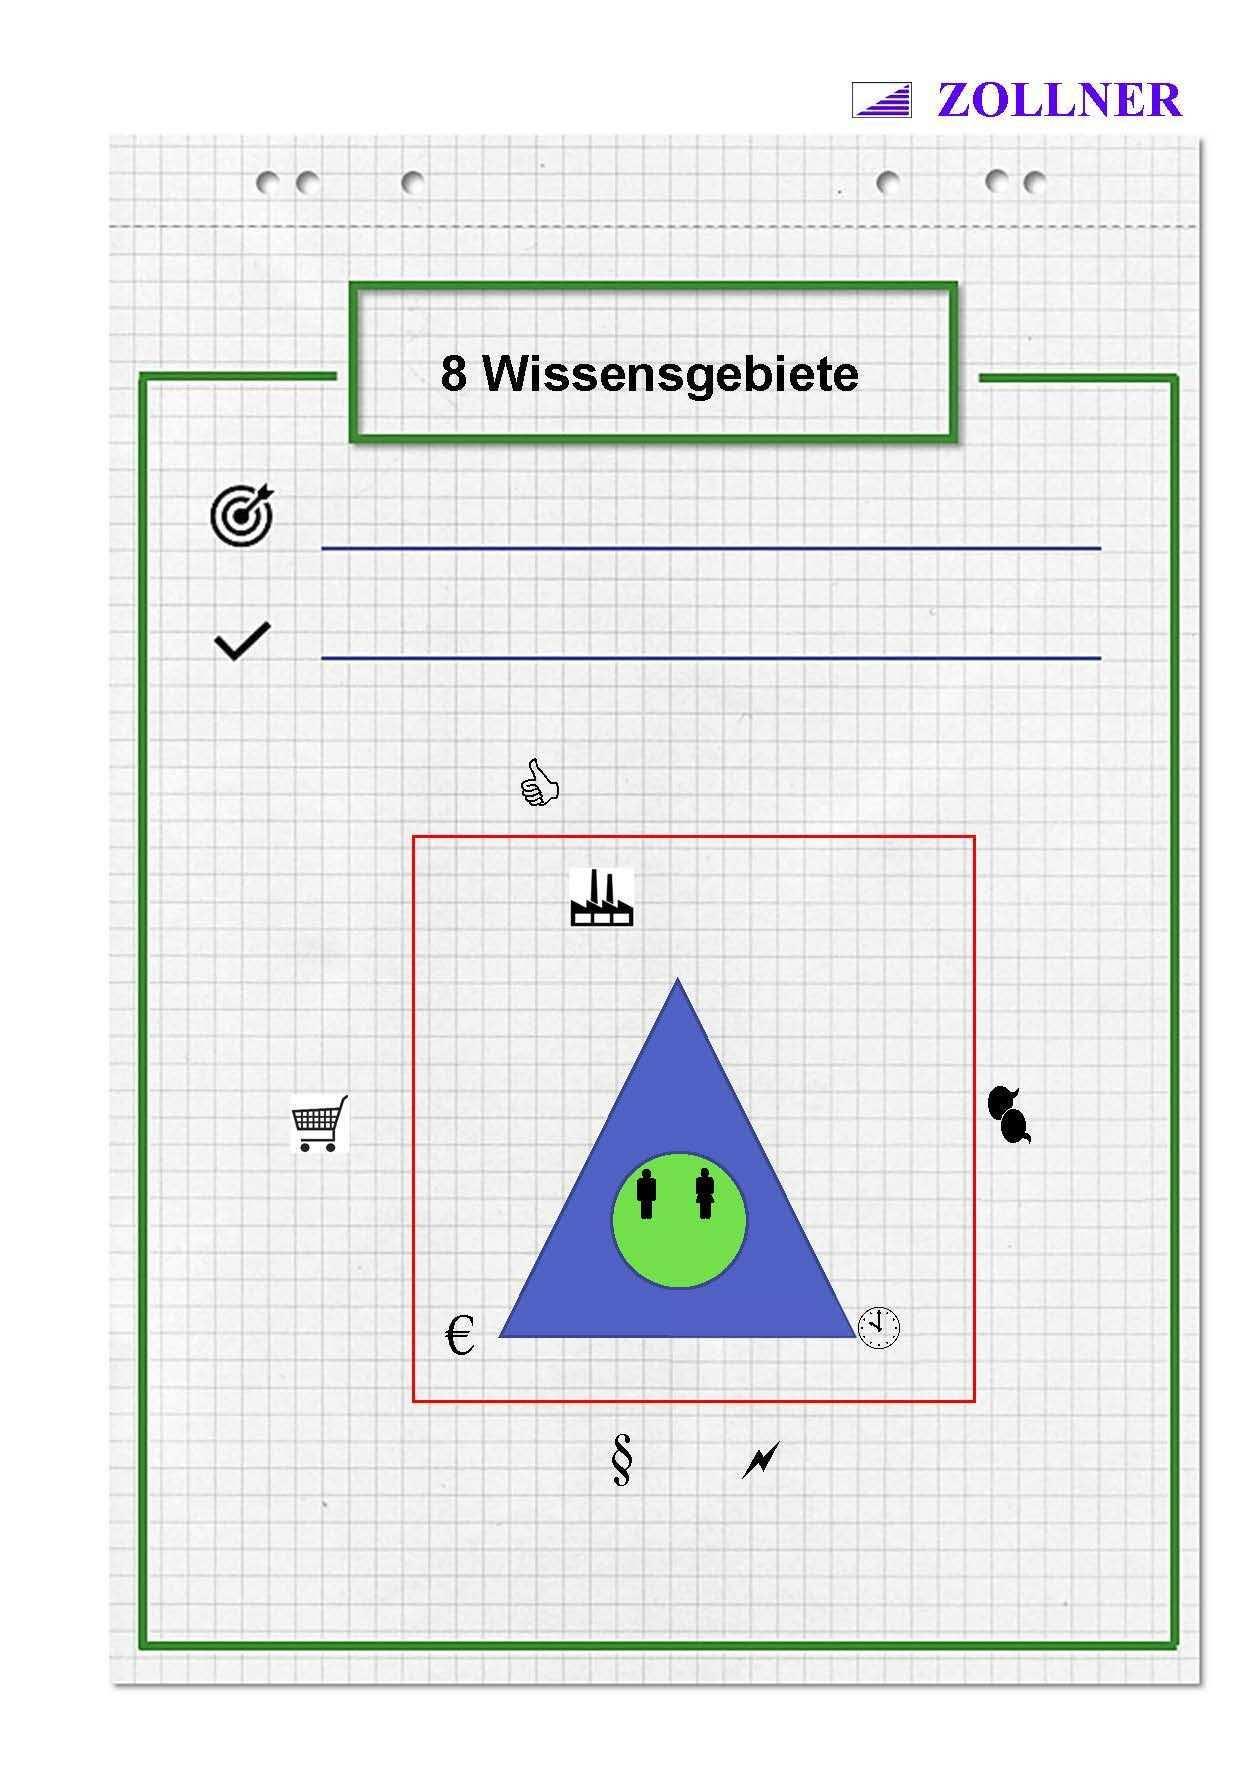 Industriemeister Mik Projektmanagement Wissensgebiete Wolfgang Zollner Projektmanagement Flipcharts Seminare